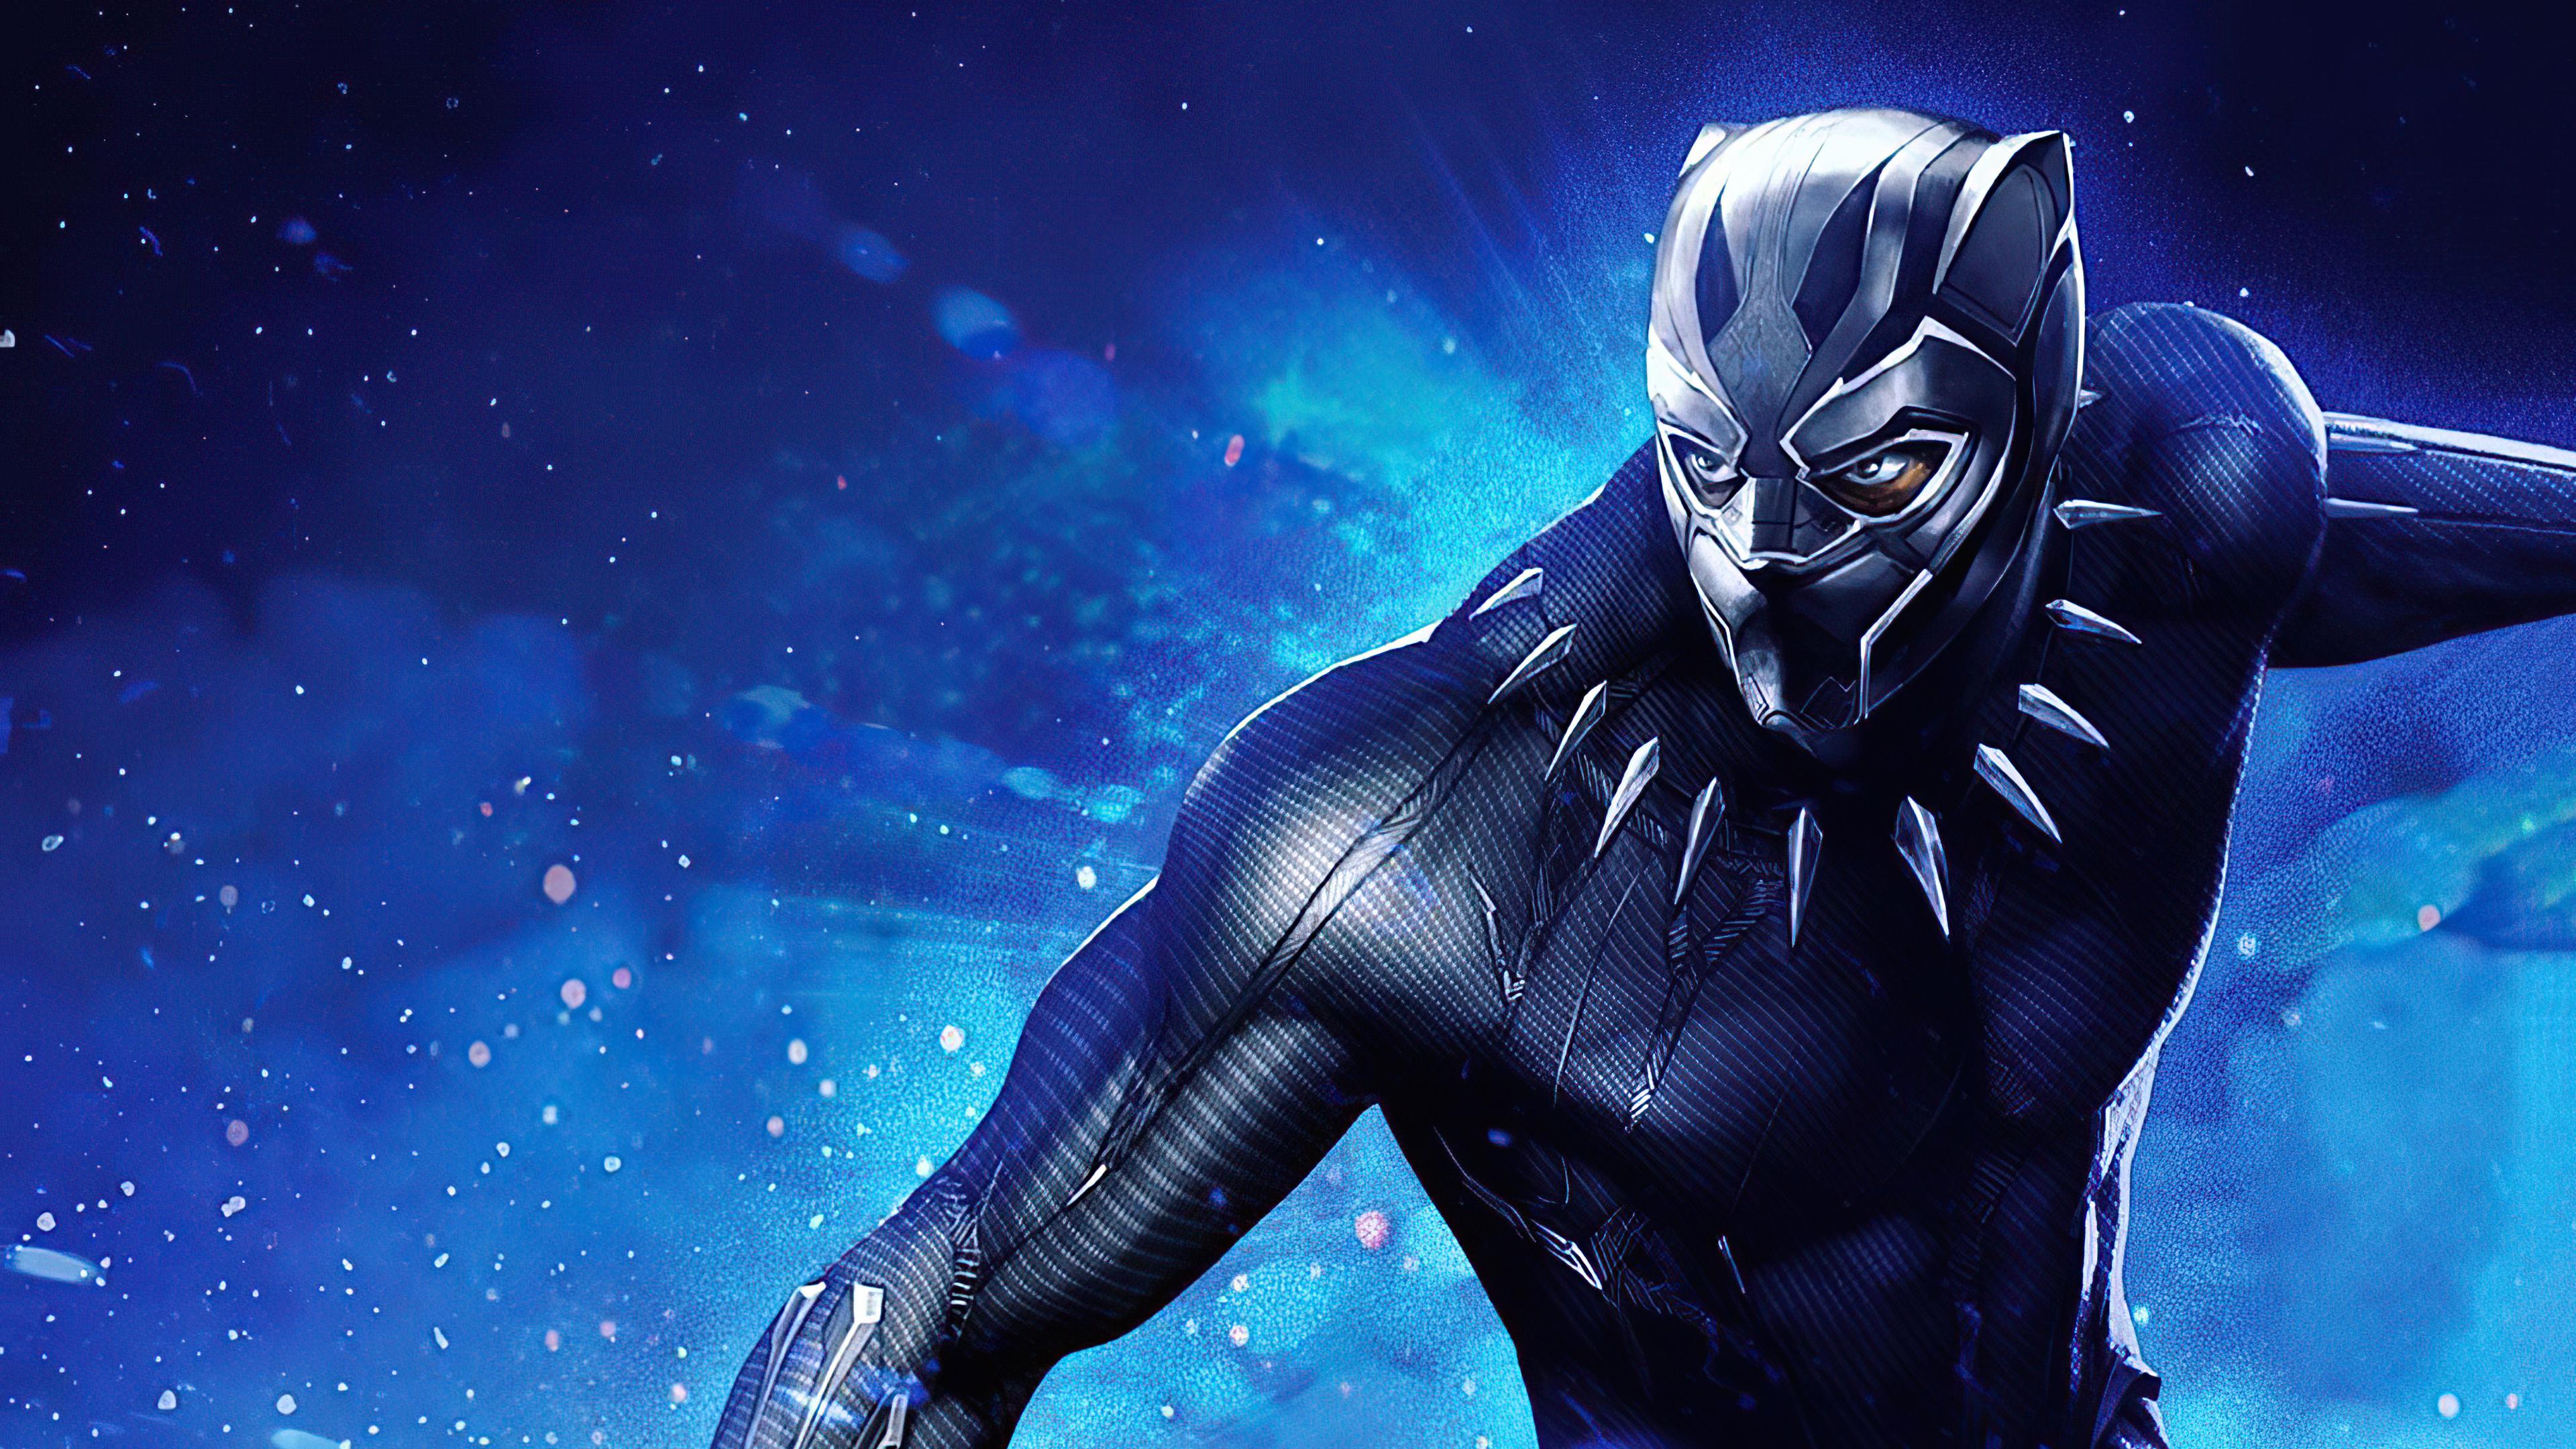 3840x2160 2020 Black Panther Coming 4k HD 4k Wallpapers ...